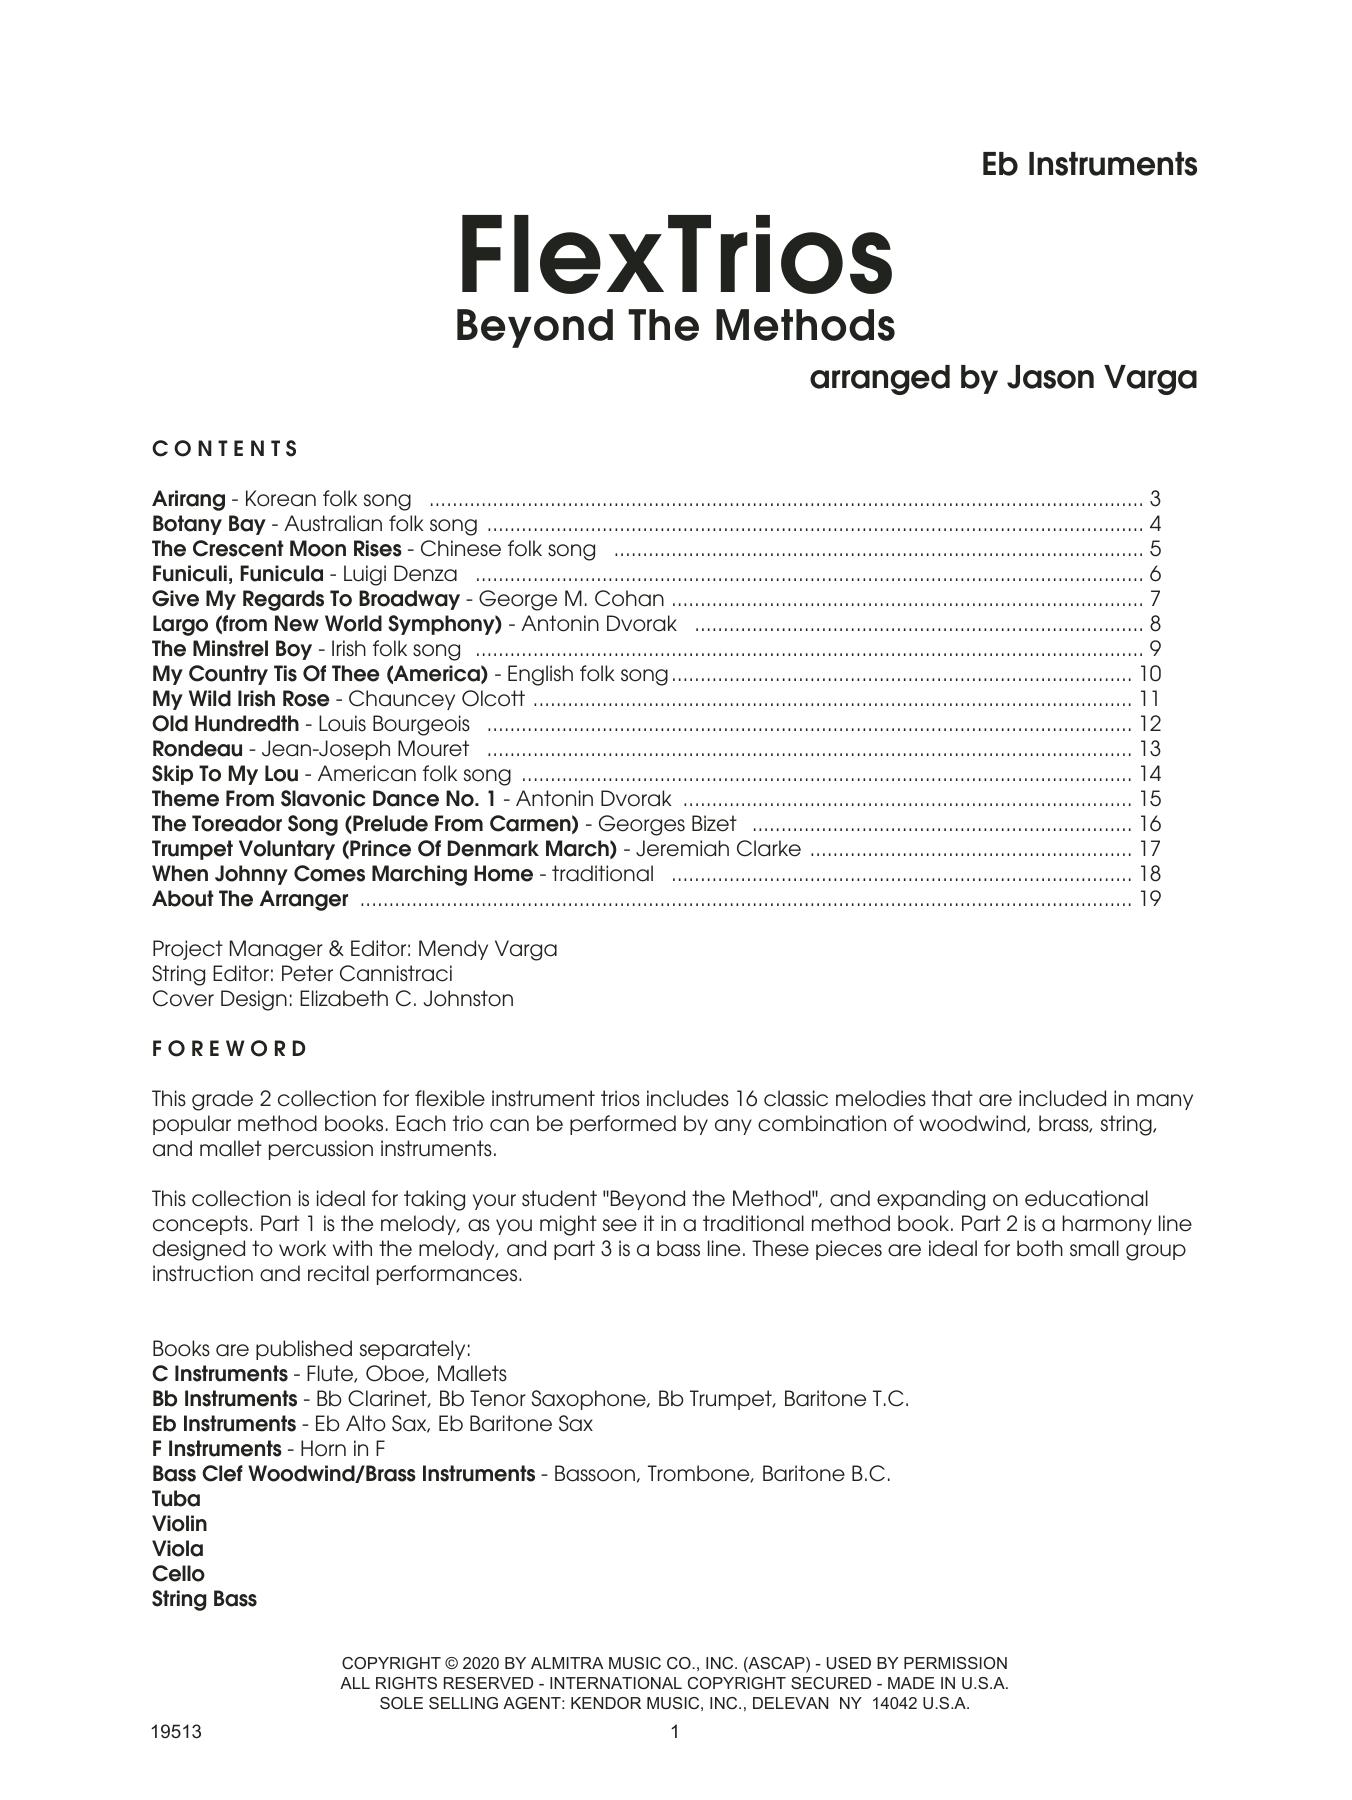 Jason Varga Flextrios - Beyond The Methods (16 Pieces) - Eb Instruments sheet music notes printable PDF score